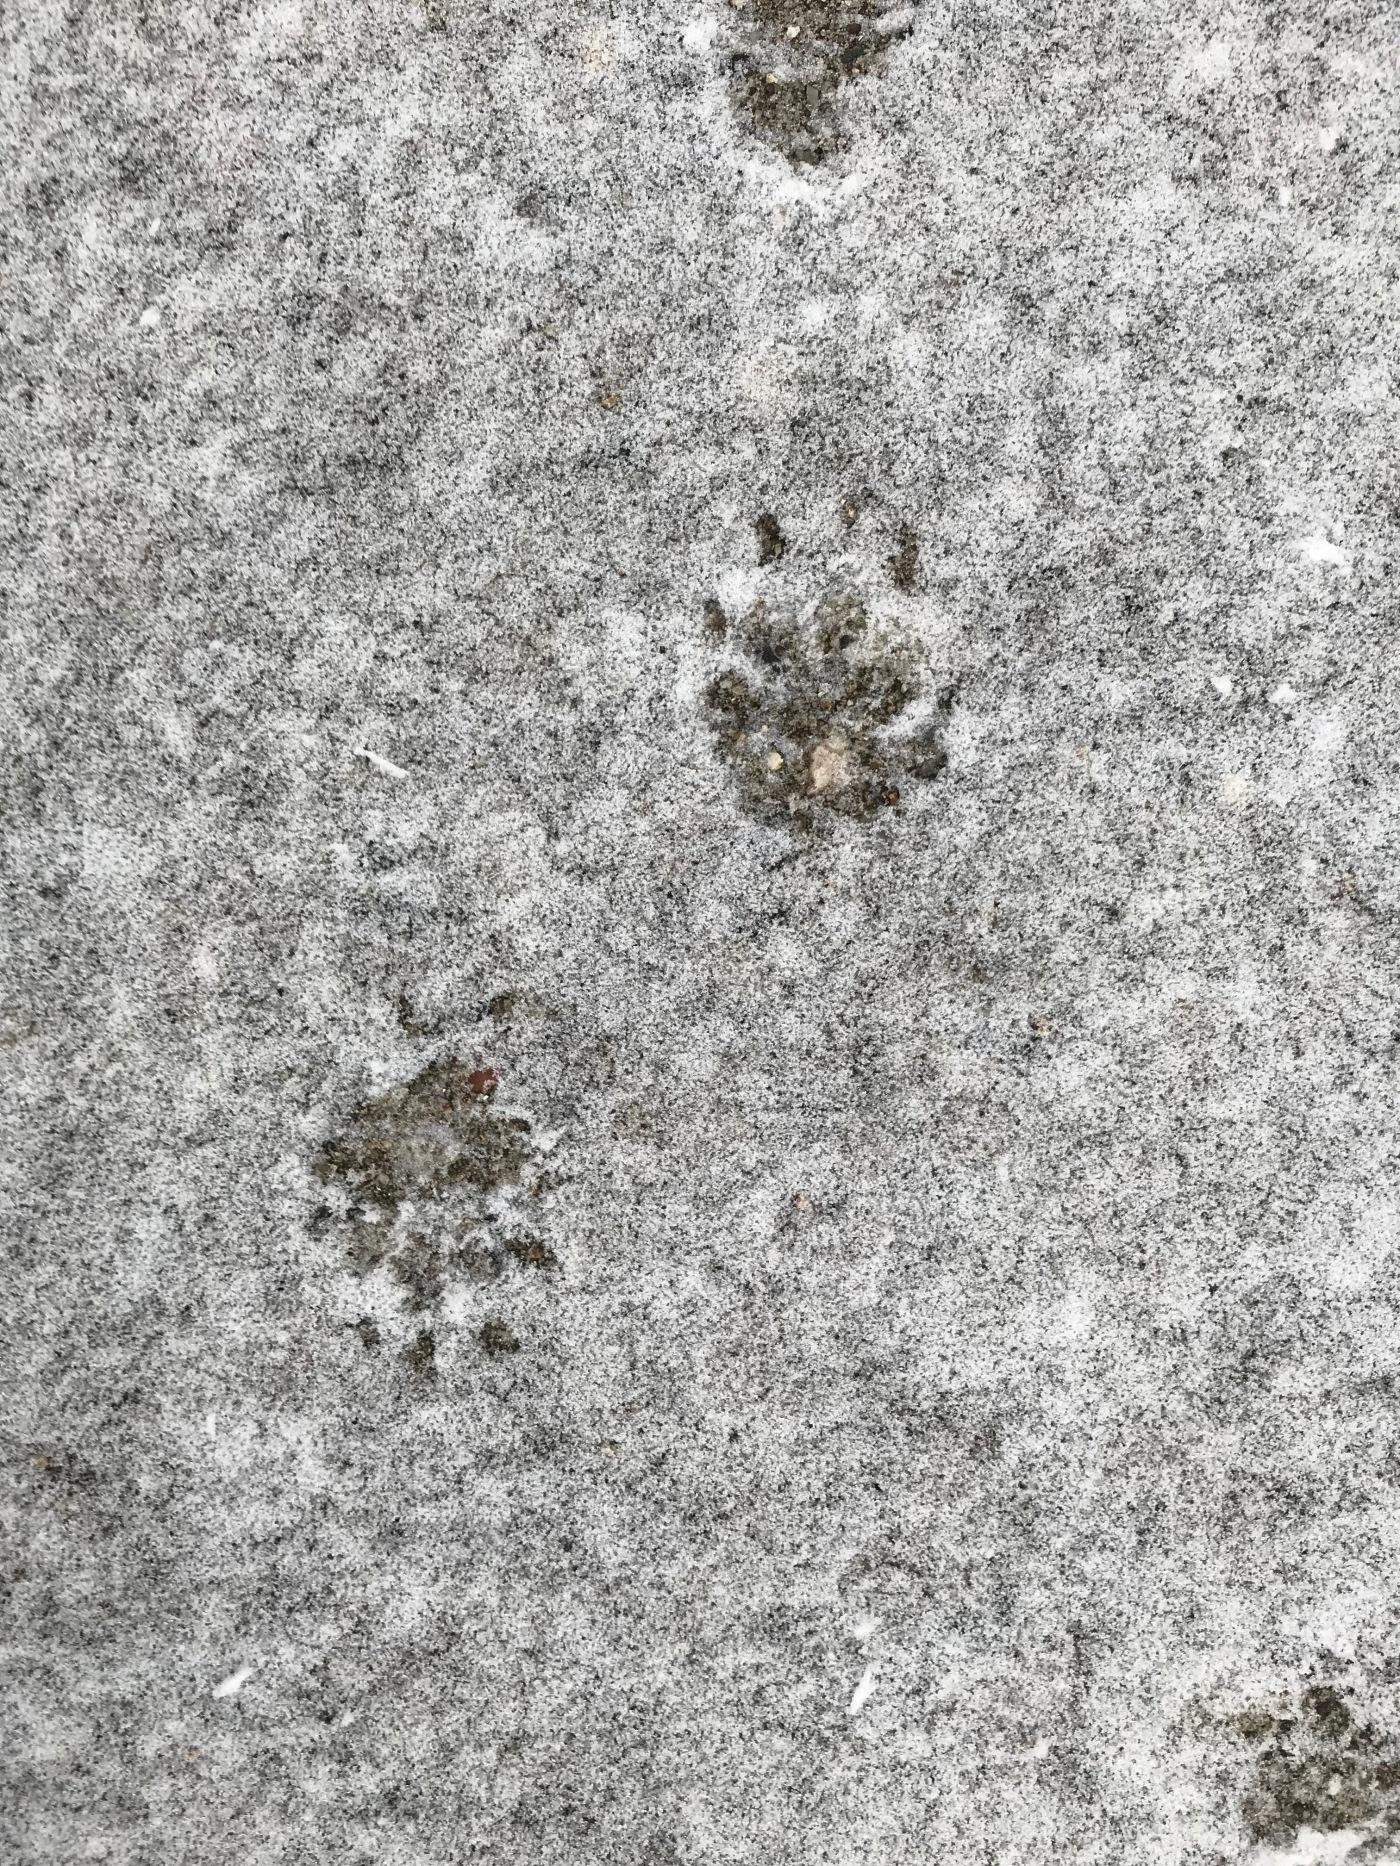 skunk prints in freshly fallen snow